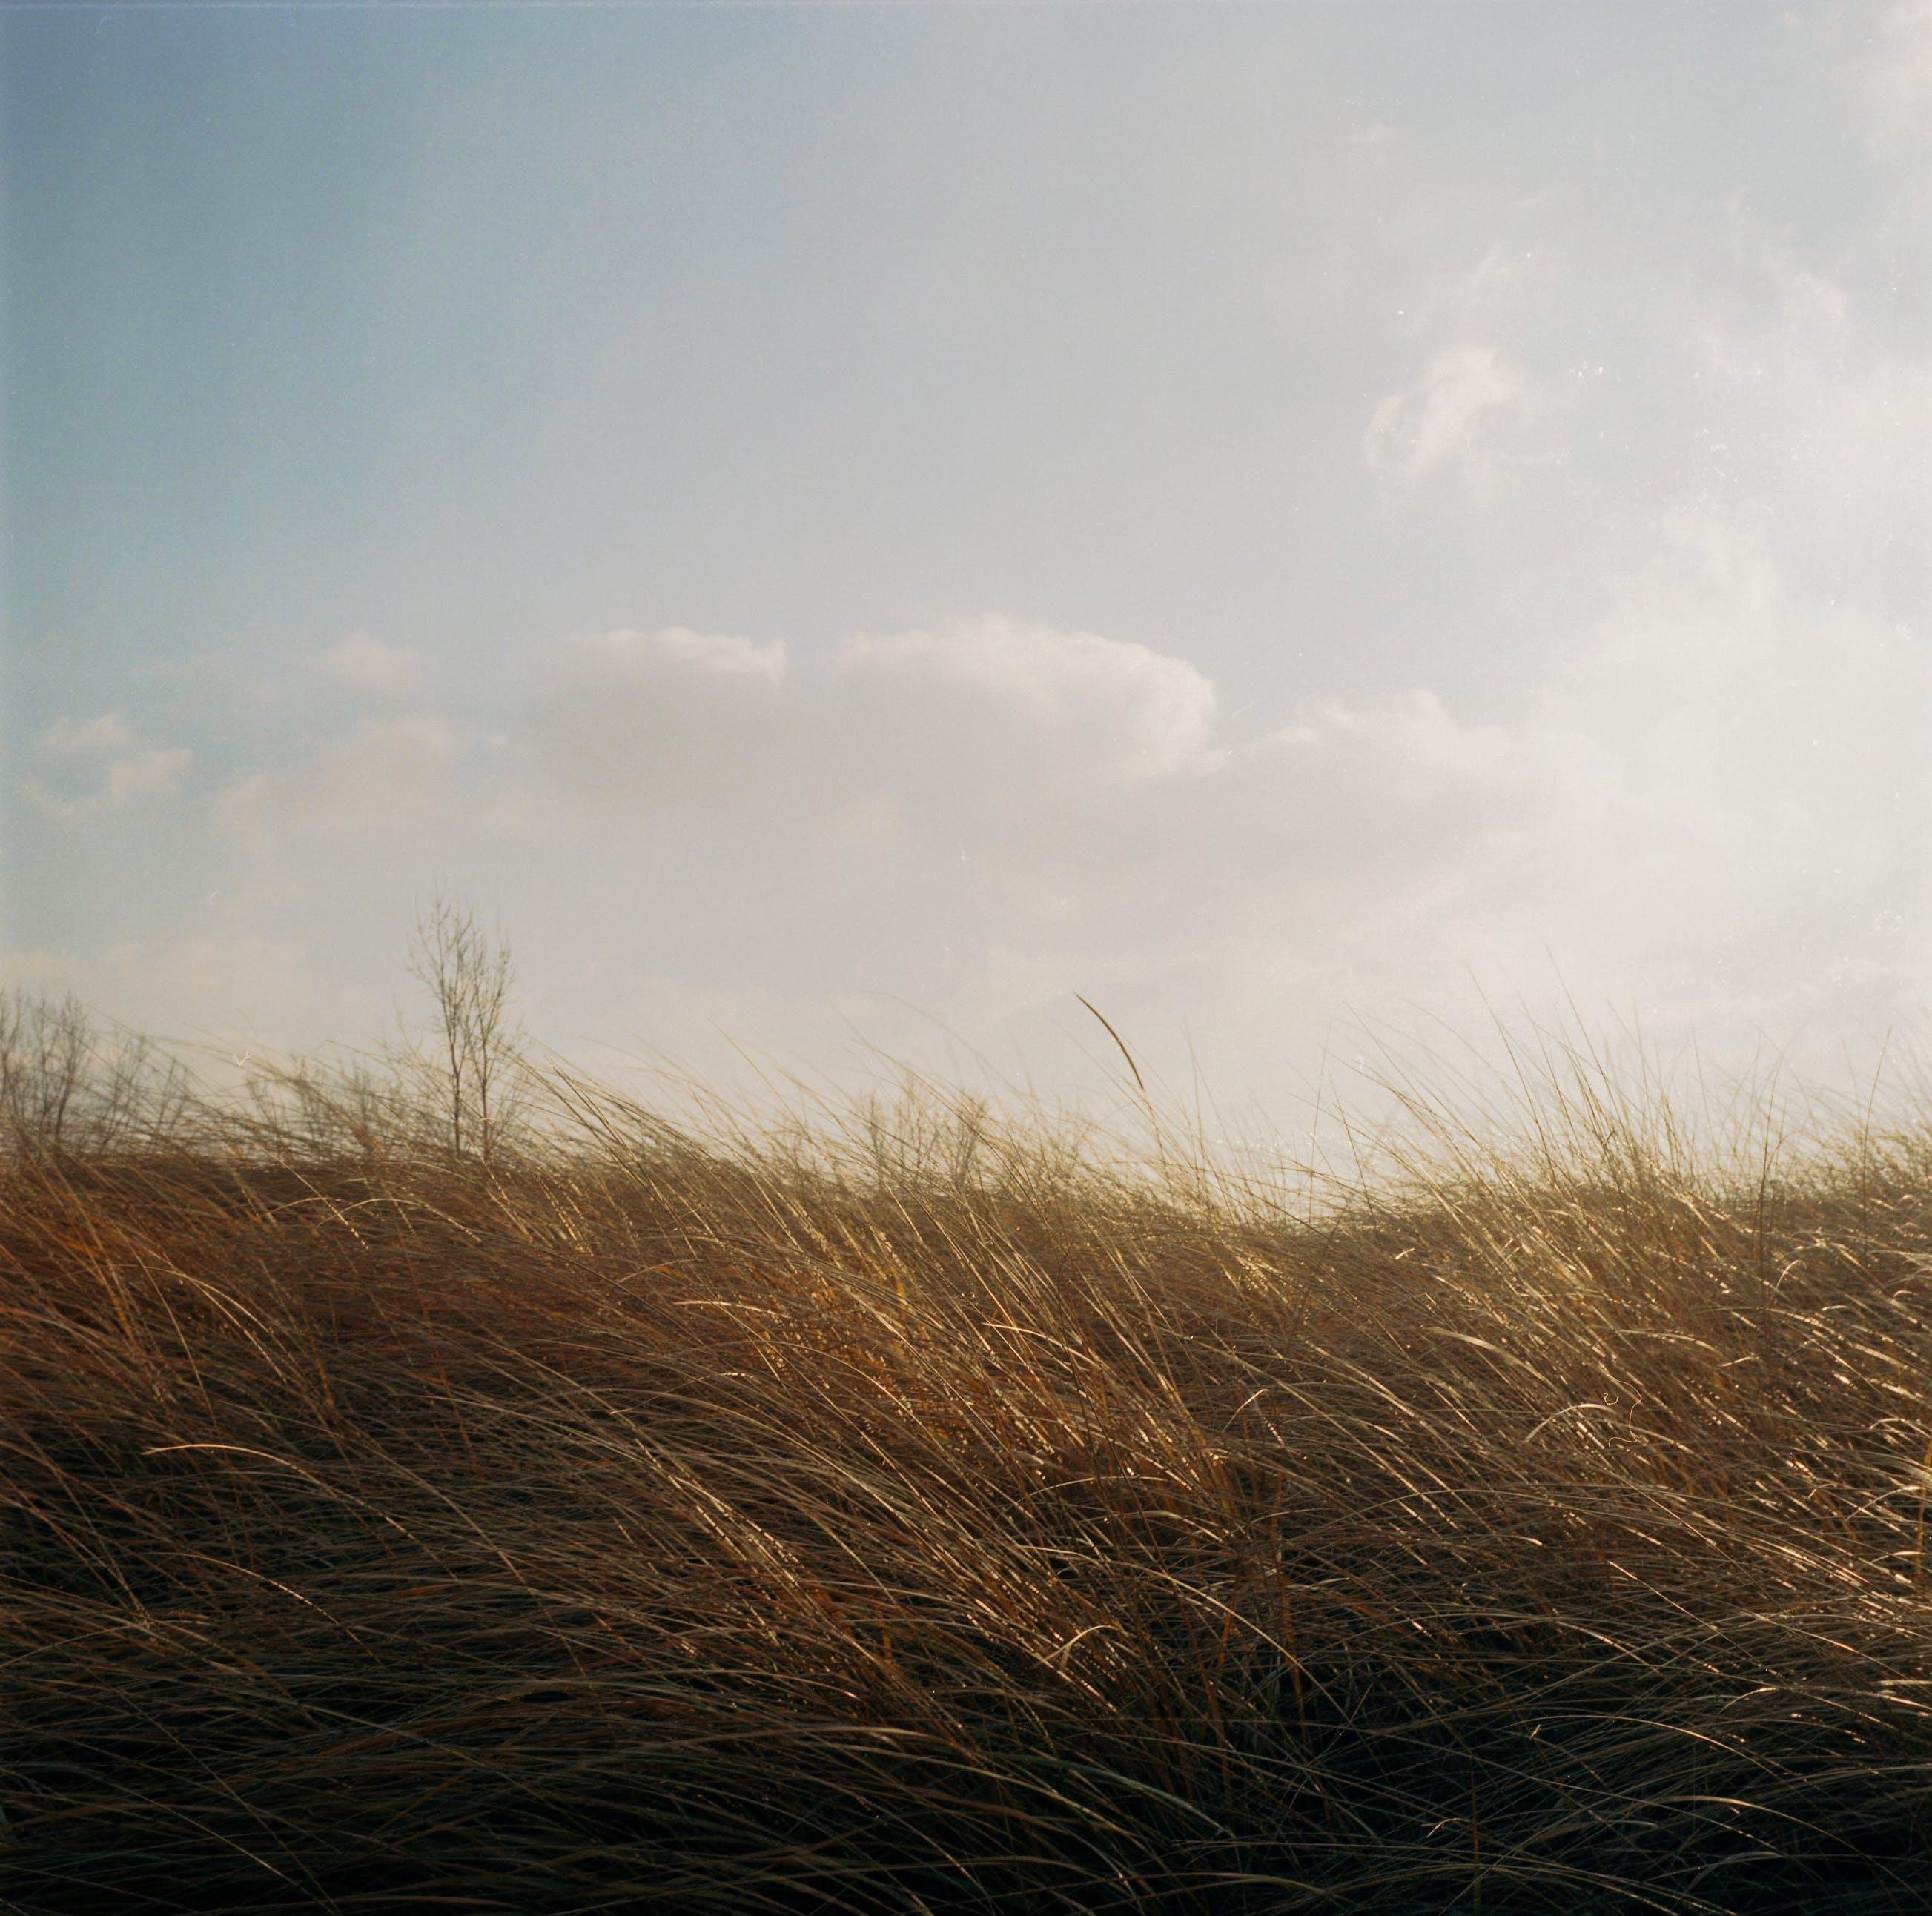 120film, portra400, yashicamat 的 免费素材照片